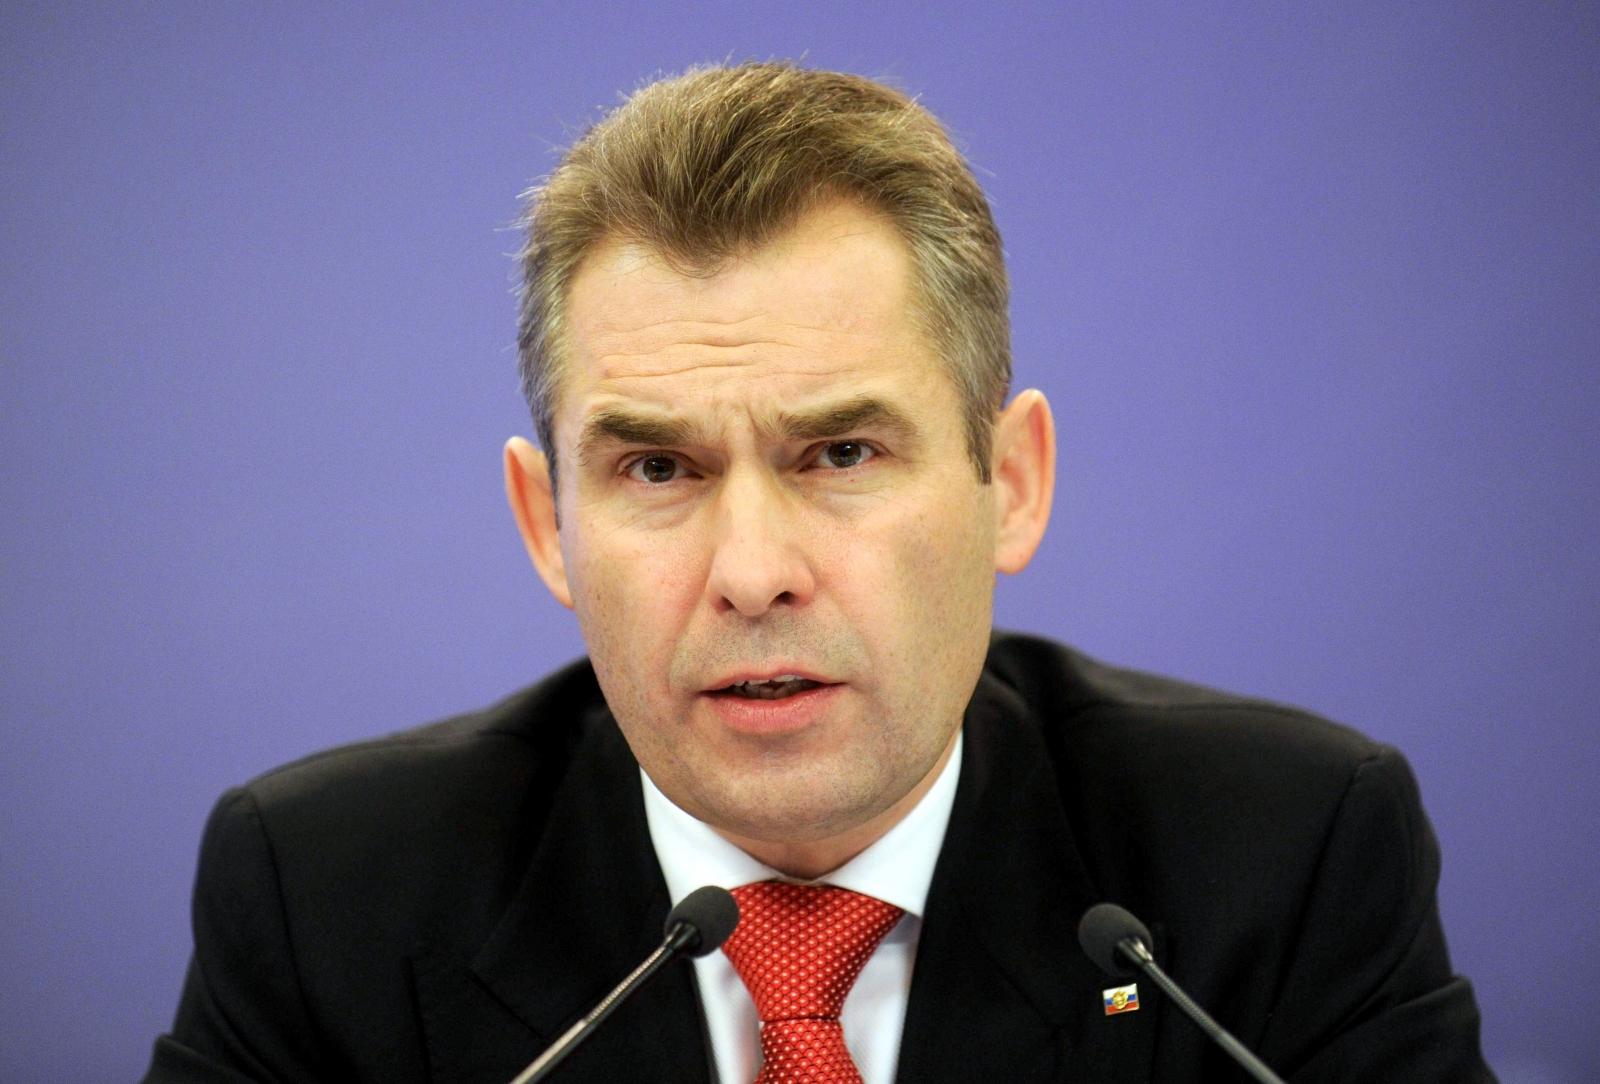 Pavel Astakhov, Russian Children's Ombudsman